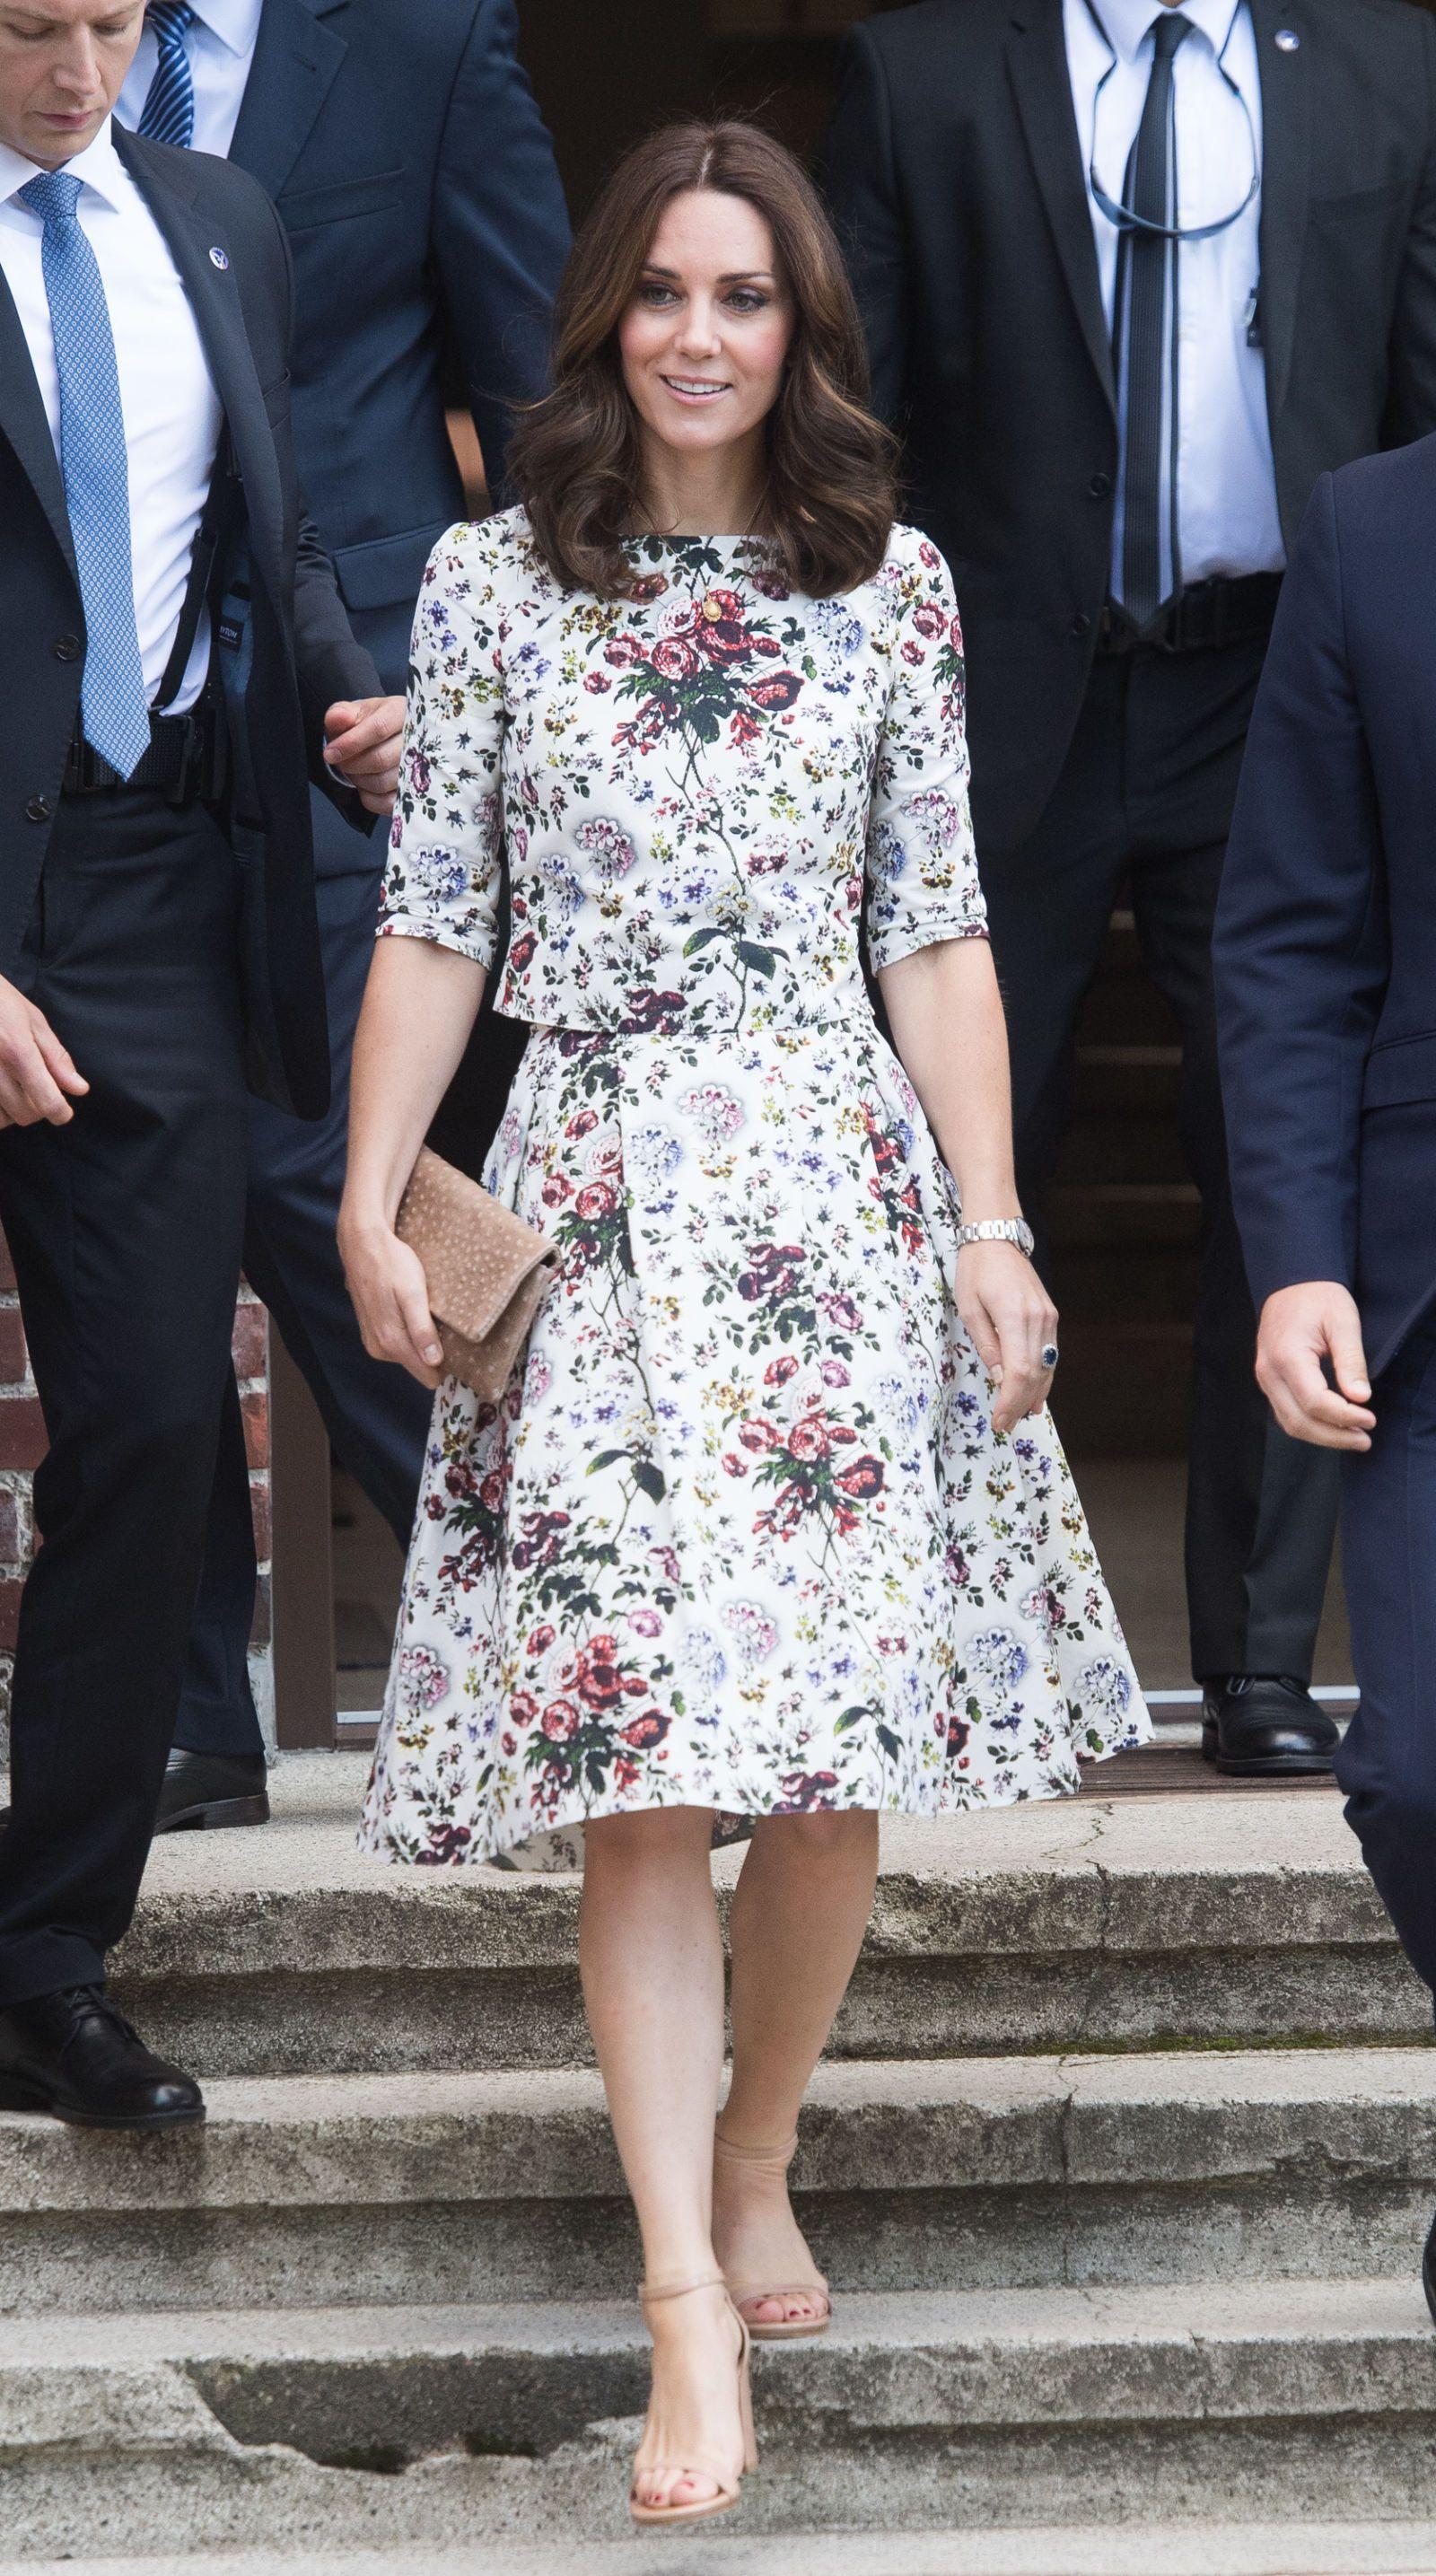 340eb22b11 Kate Middleton Stuns In Blue Elie Saab Dress At Royal Ascot | Kate ...